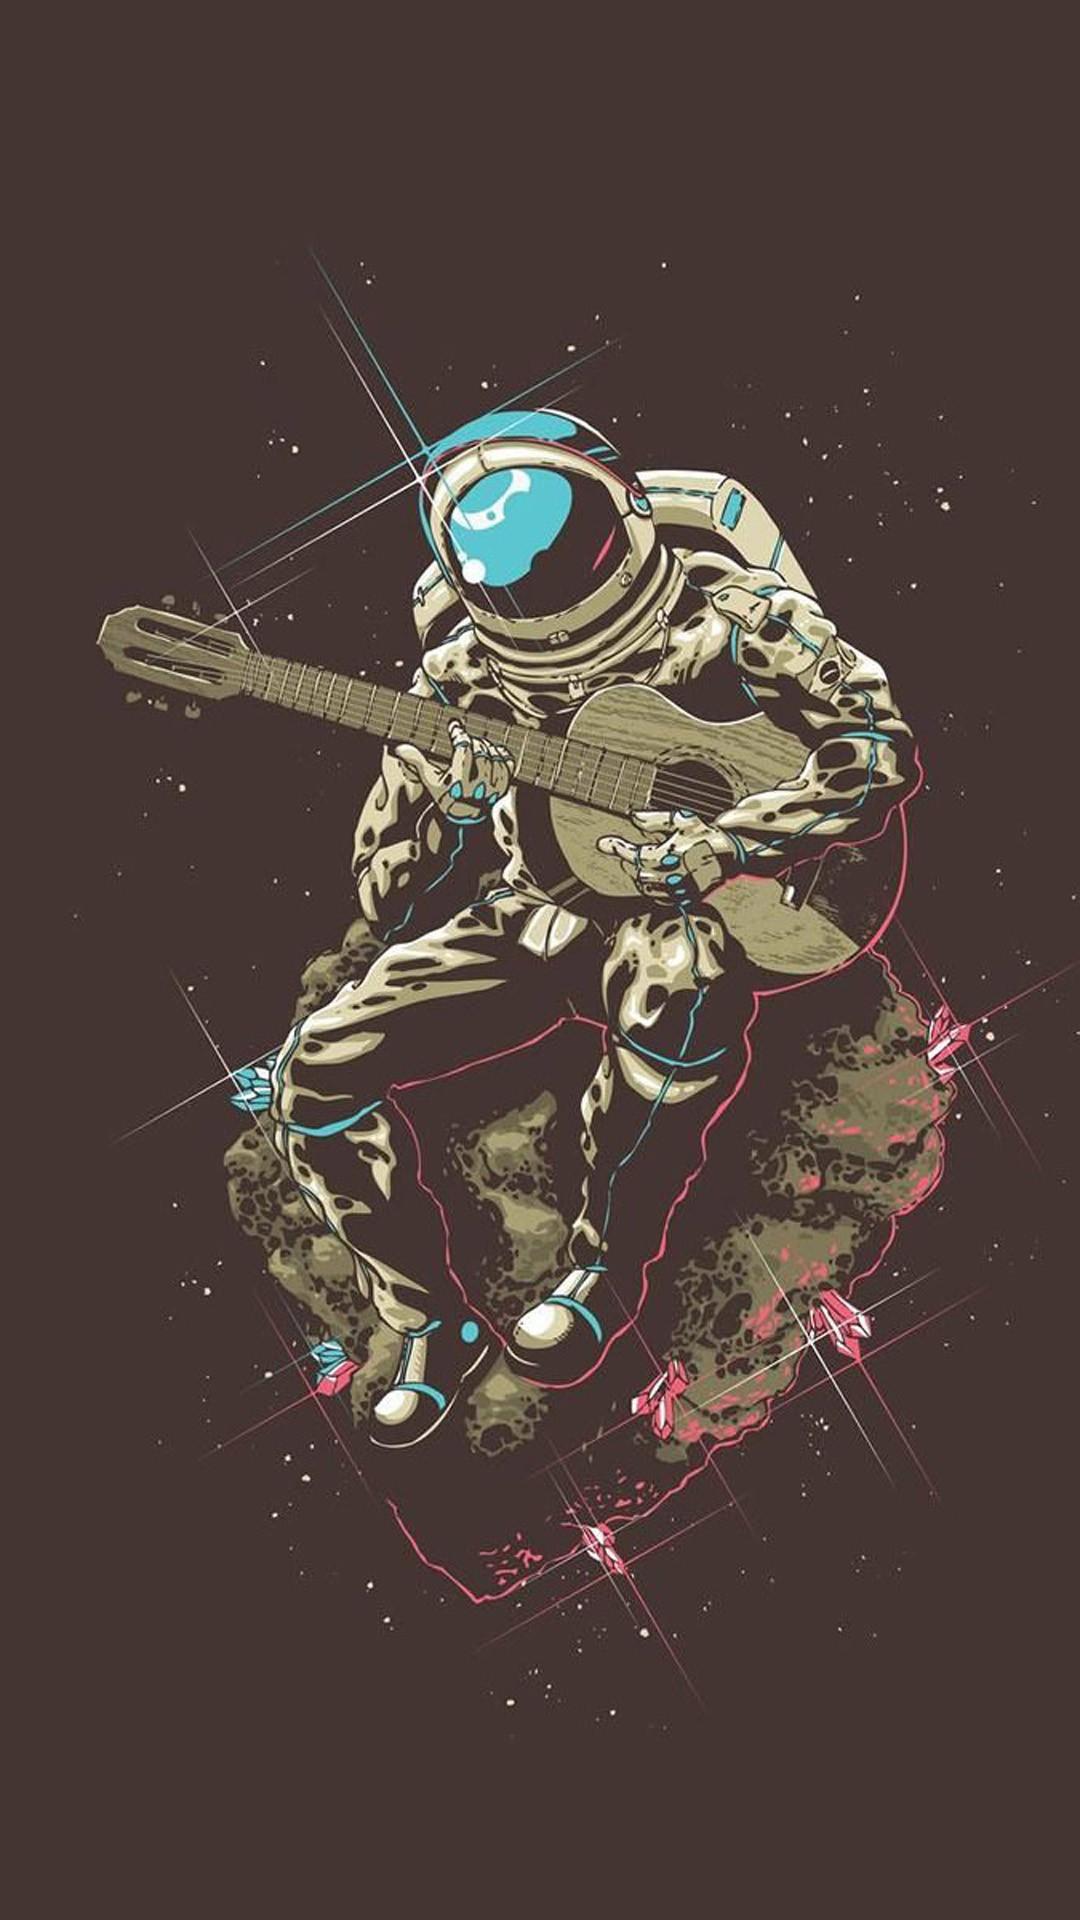 Electric Guitar Wallpaper Hd Astronaut Iphone Background Hd Pixelstalk Net